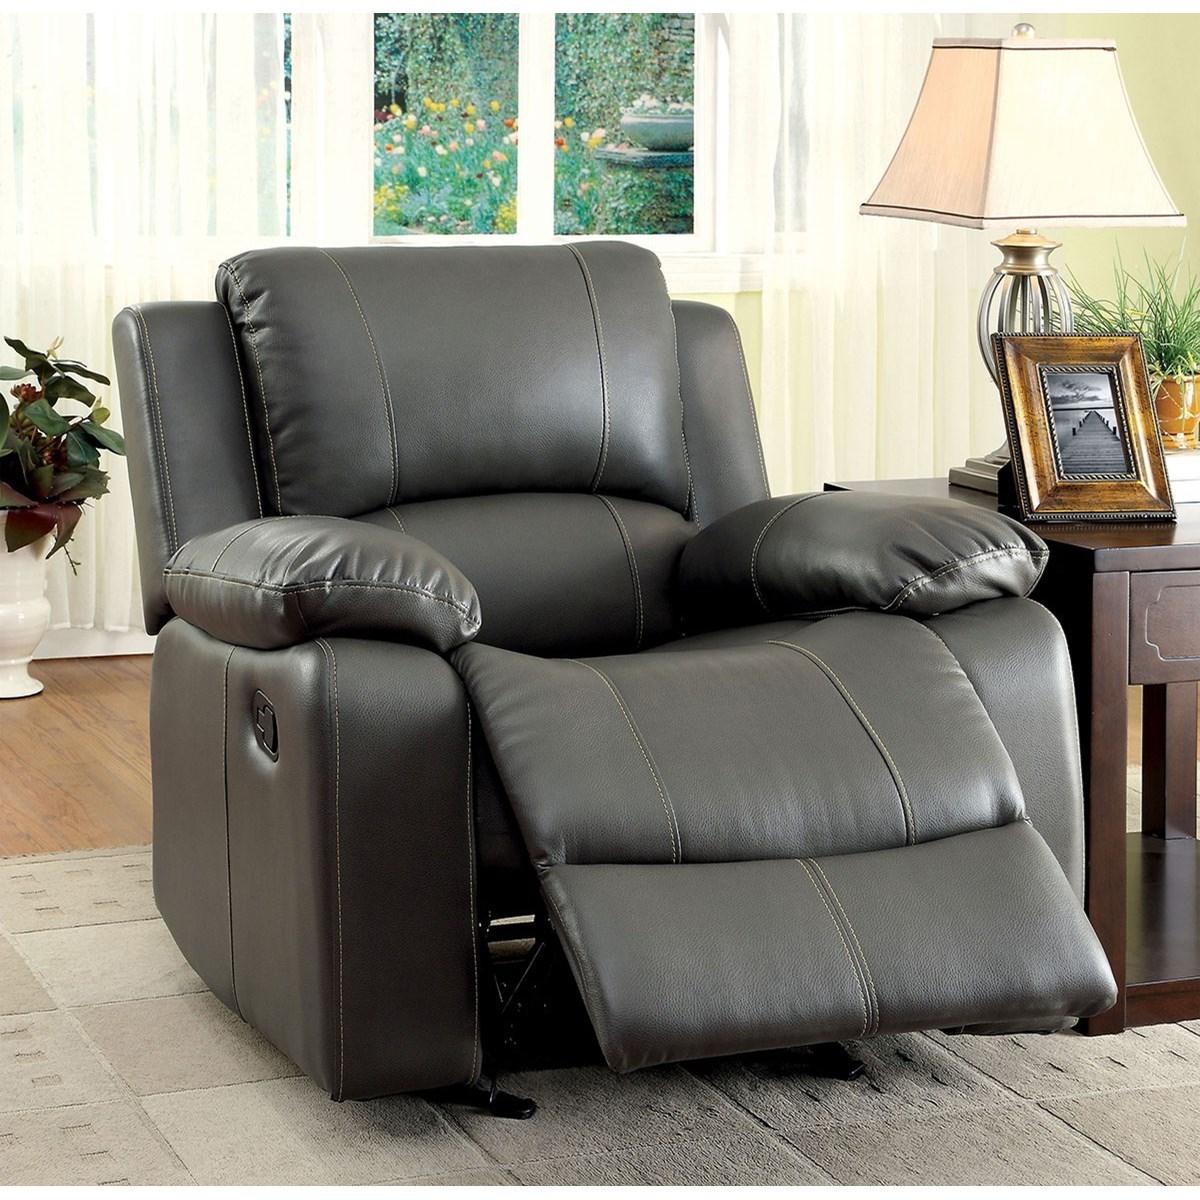 Sarles Recliner at Household Furniture